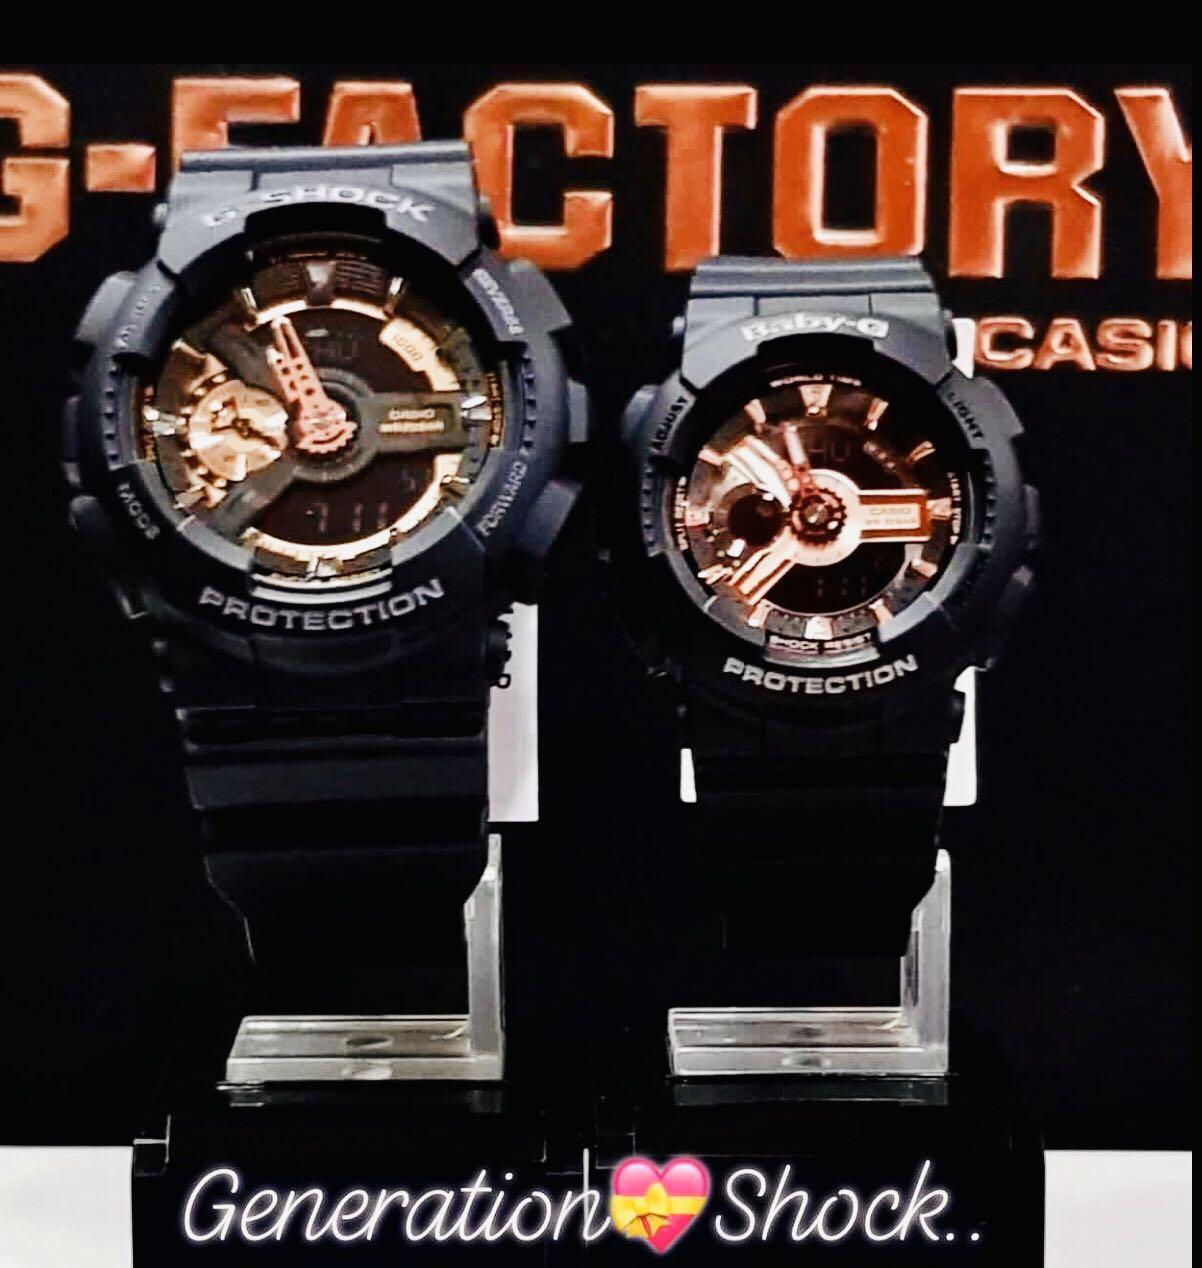 NEW🌟COUPLE💝SET : BABY-G🌟G-SHOCK UNISEX DIVER SPORTS WATCH : 100% ORIGINAL AUTHENTIC CASIO BABYG + GSHOCK : GA-110-RG-1ADR + BA-110-RG-1ADR (BLACK ROSE-GOLD)